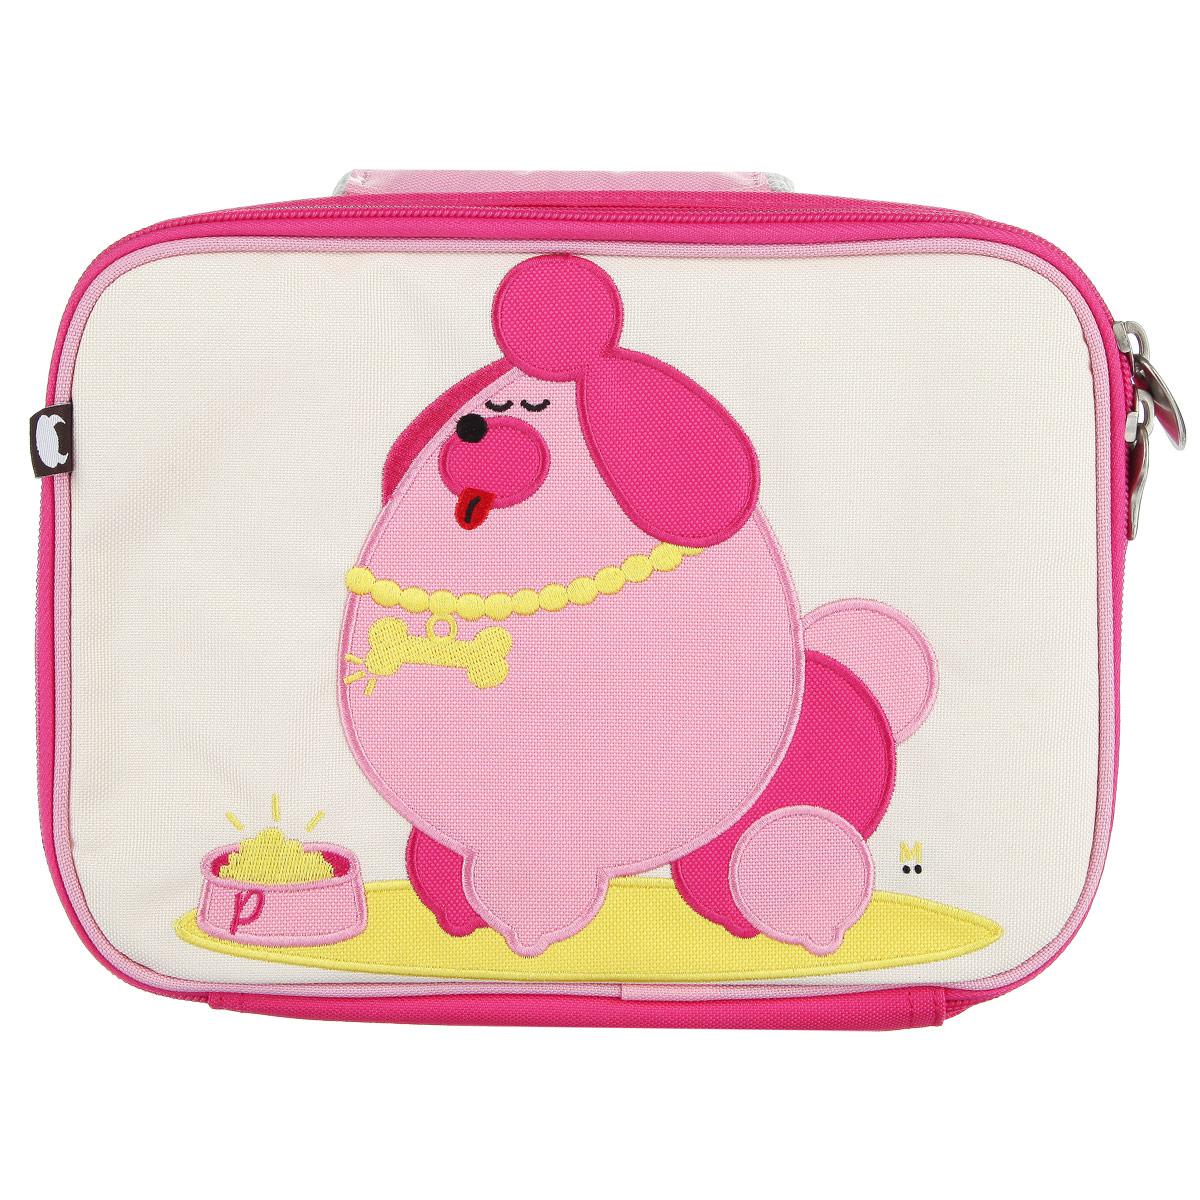 Ланч-Бокс Pocchari - Poodle, цвет: розовый, бежевый